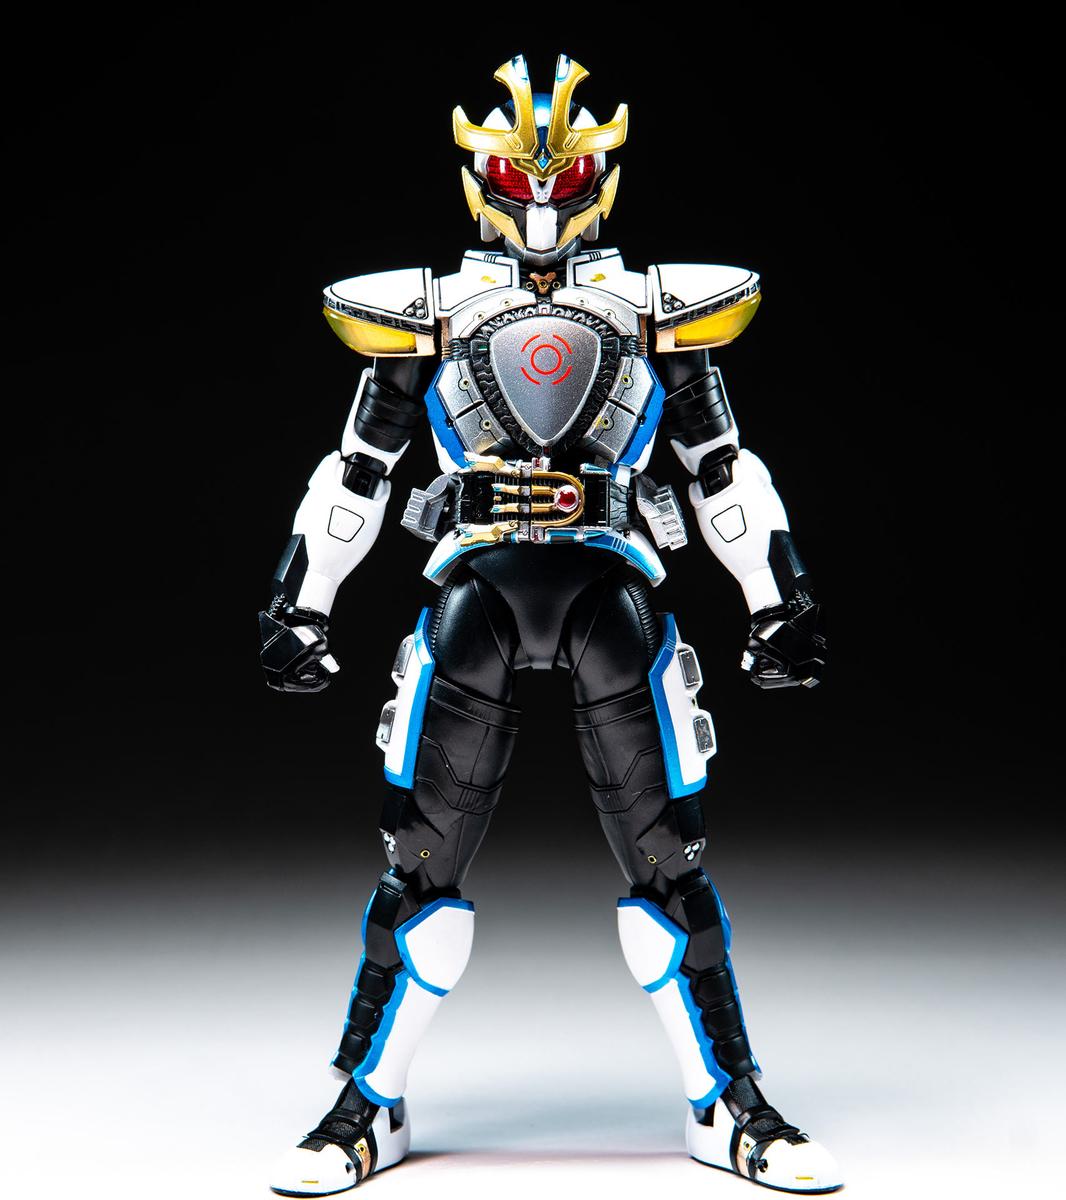 f:id:hiroban-ch:20210718035624j:plain